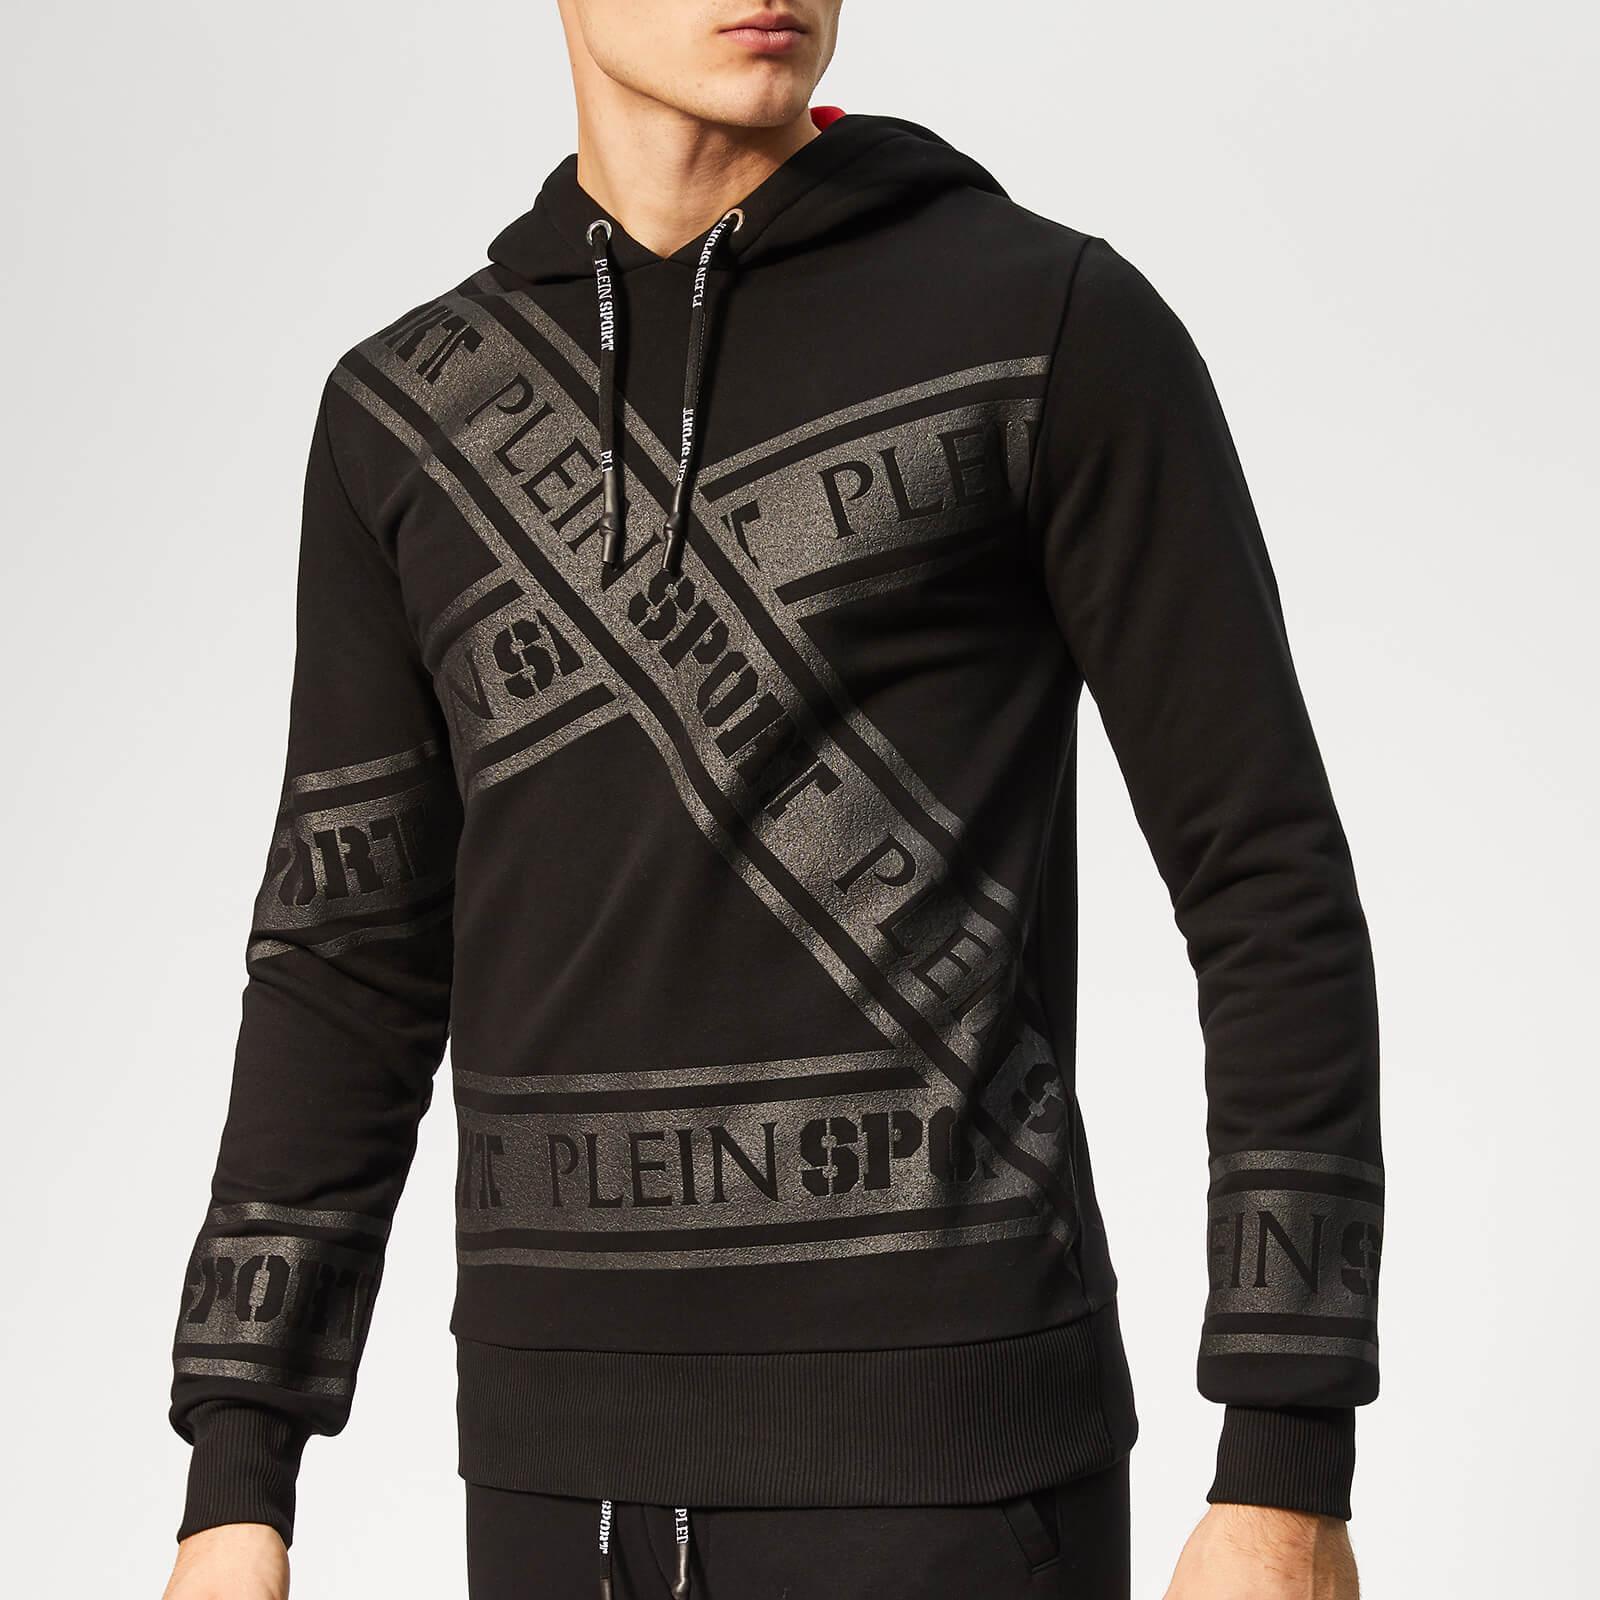 Plein Sport Men's Tape Stripes Hooded Sweatshirt - Black - S - Black